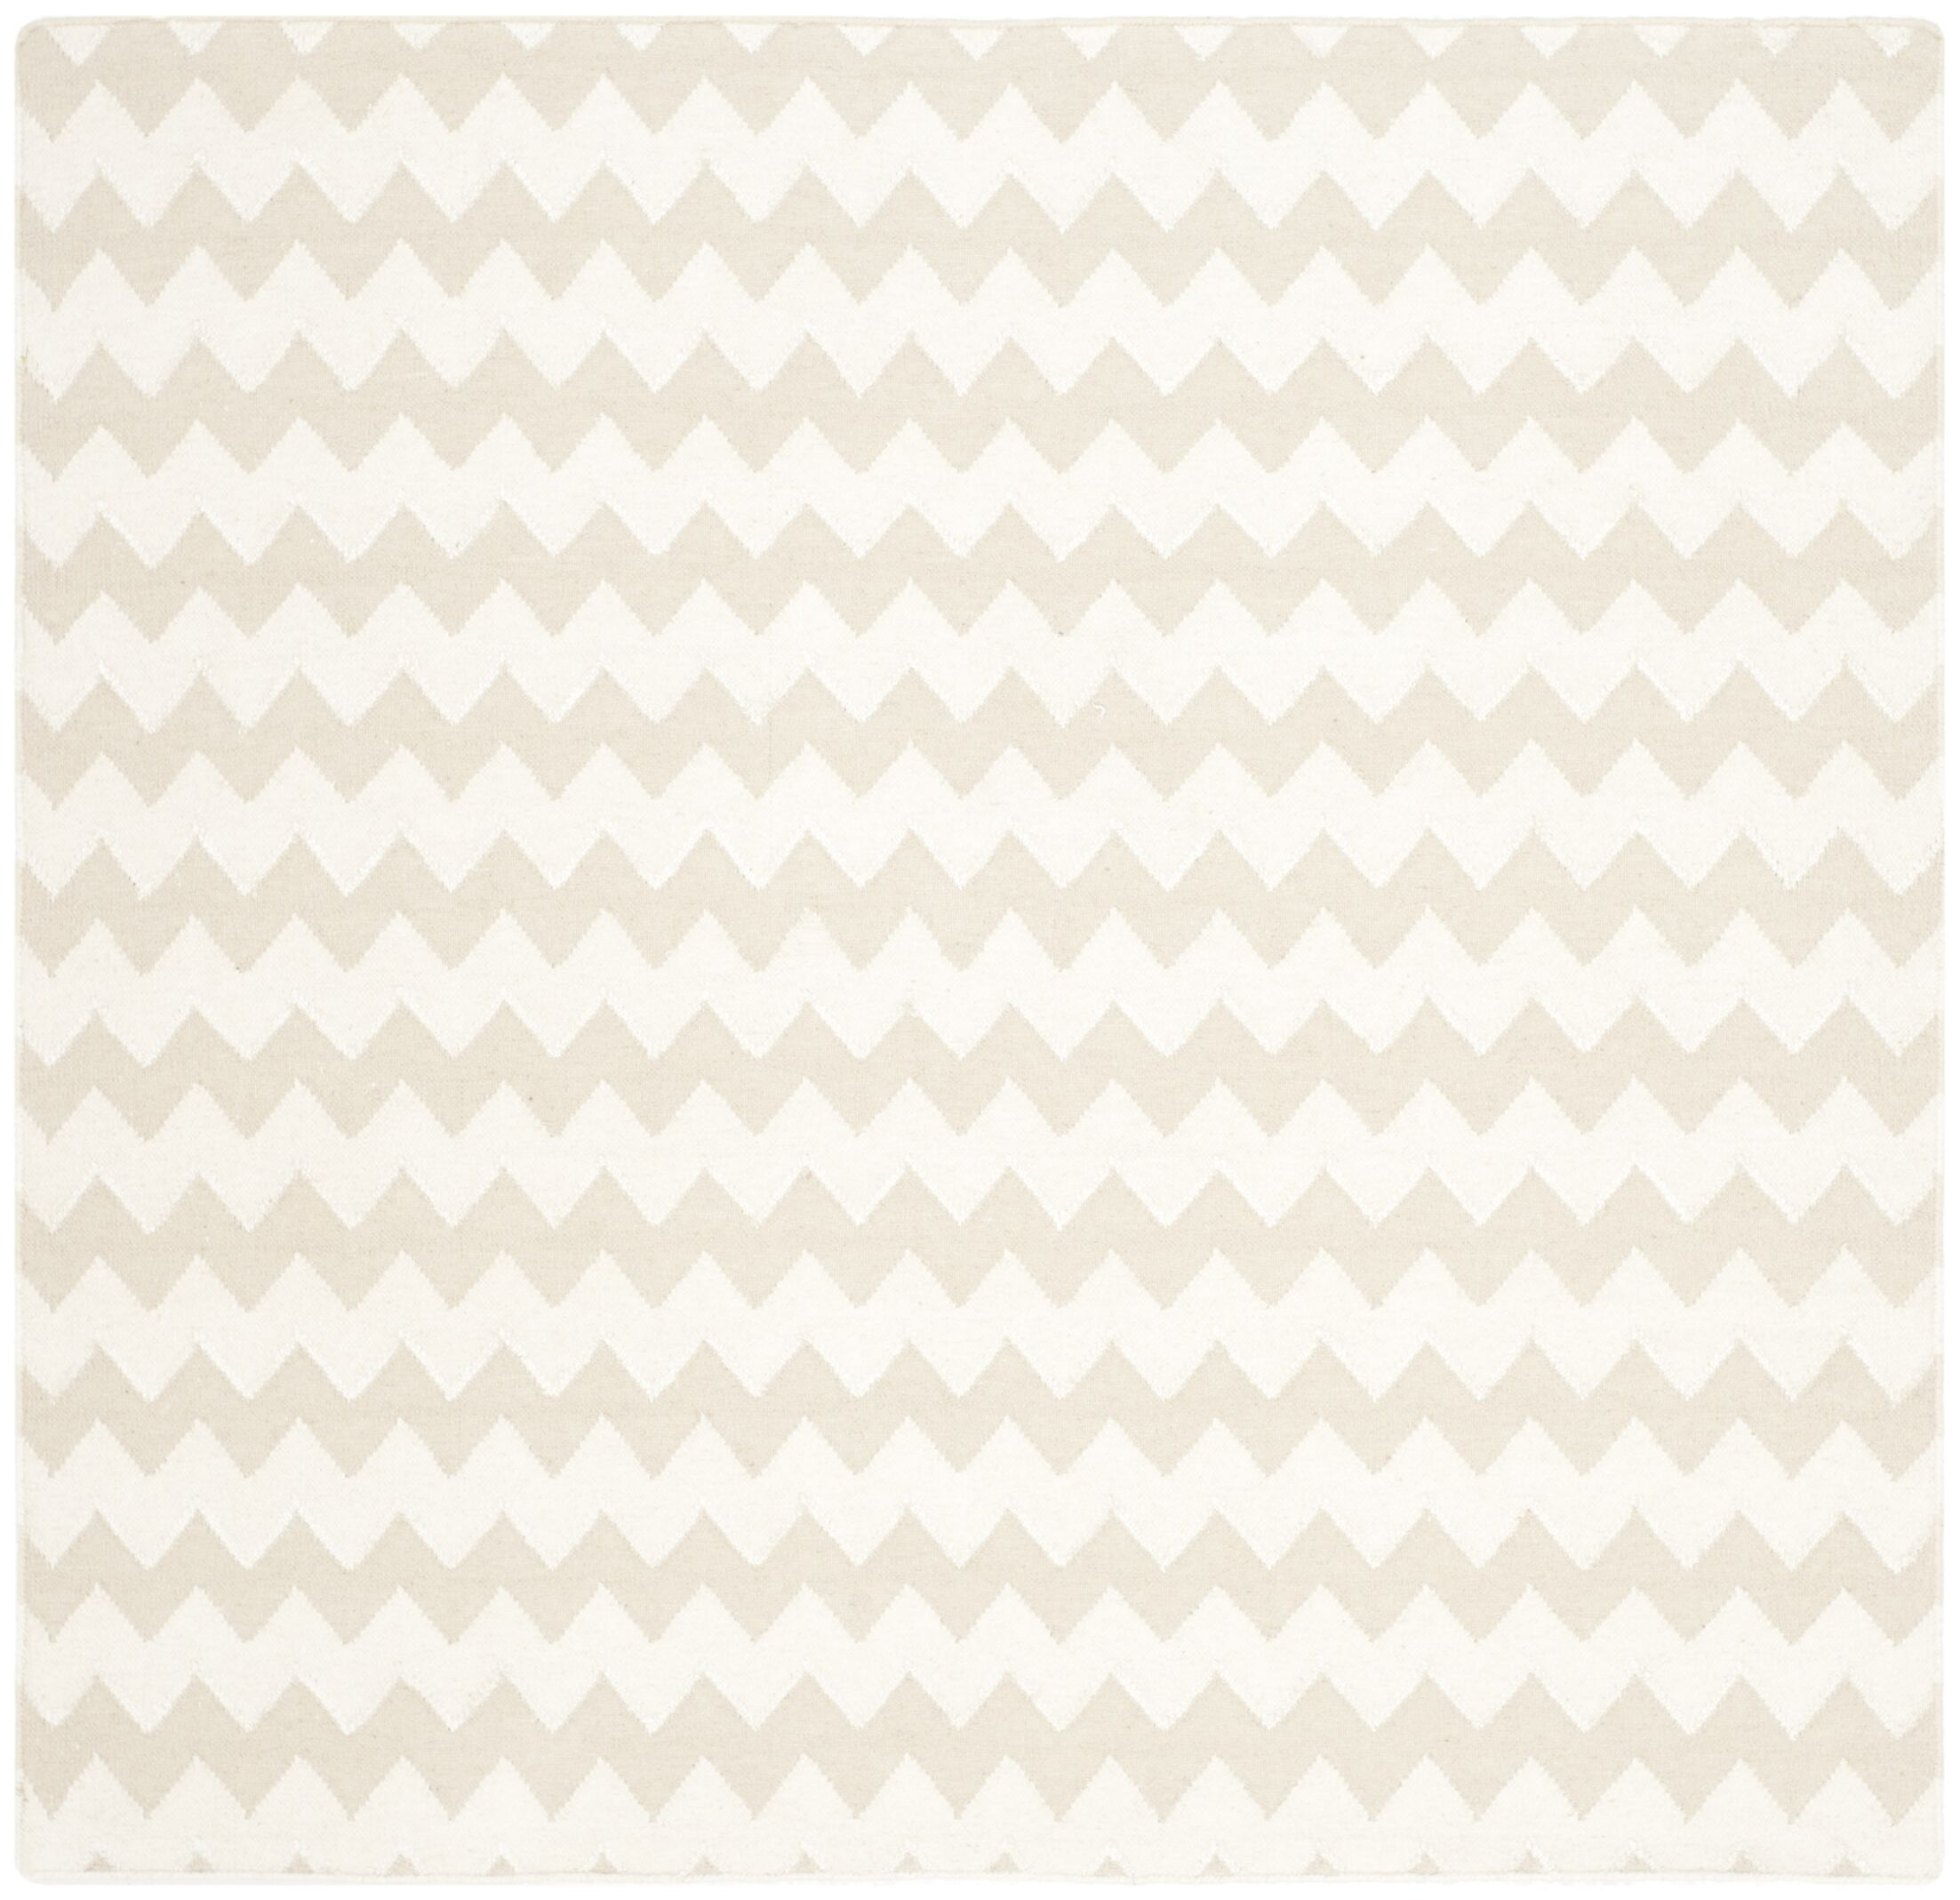 Dhurries Wool Beige/Ivory Area Rug Rug Size: Square 6'